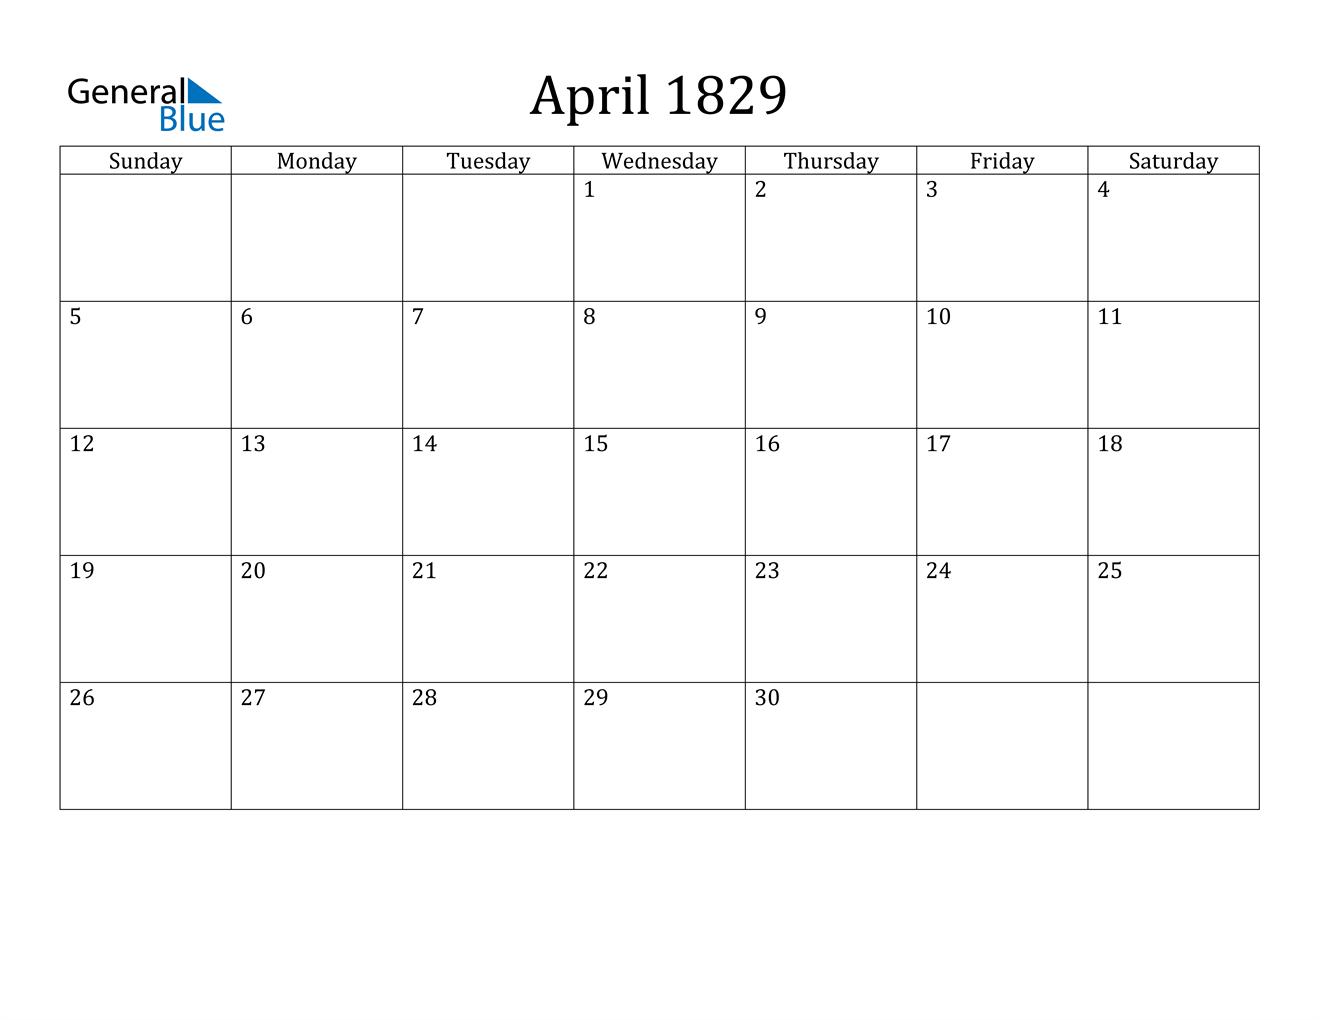 Image of April 1829 Calendar